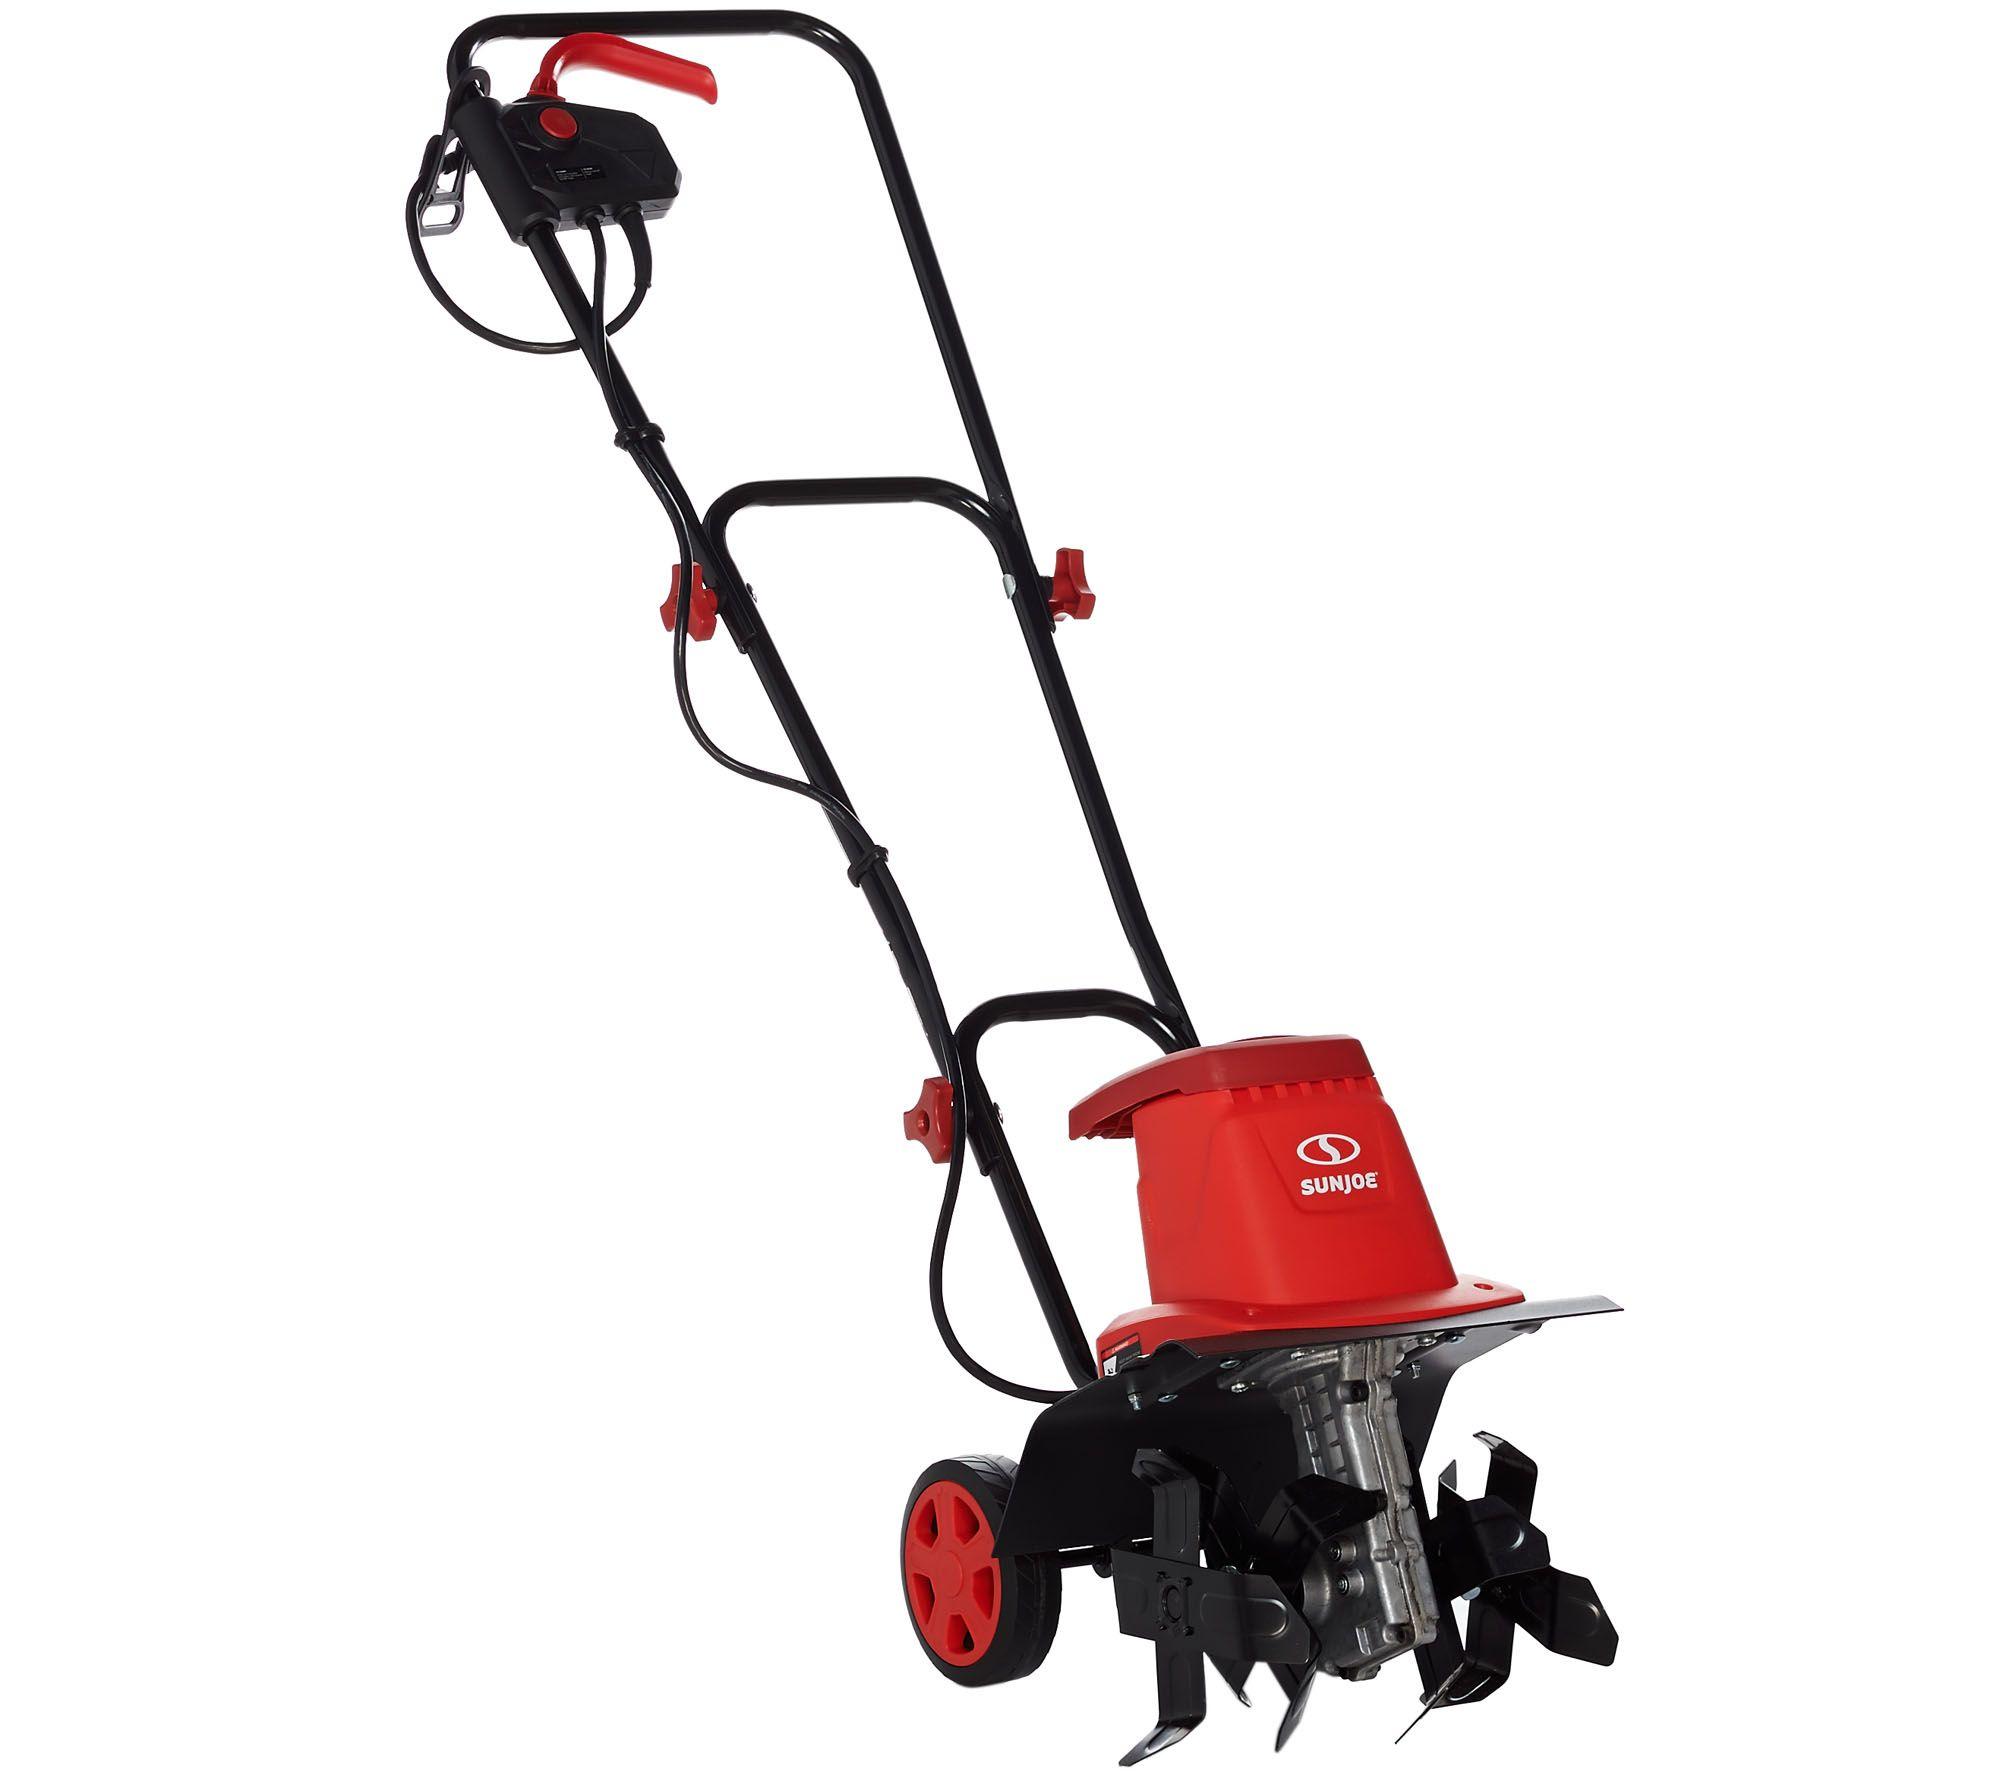 Sun Joe 12 Electric Garden Tiller and Cultivator w 8Amp Motor